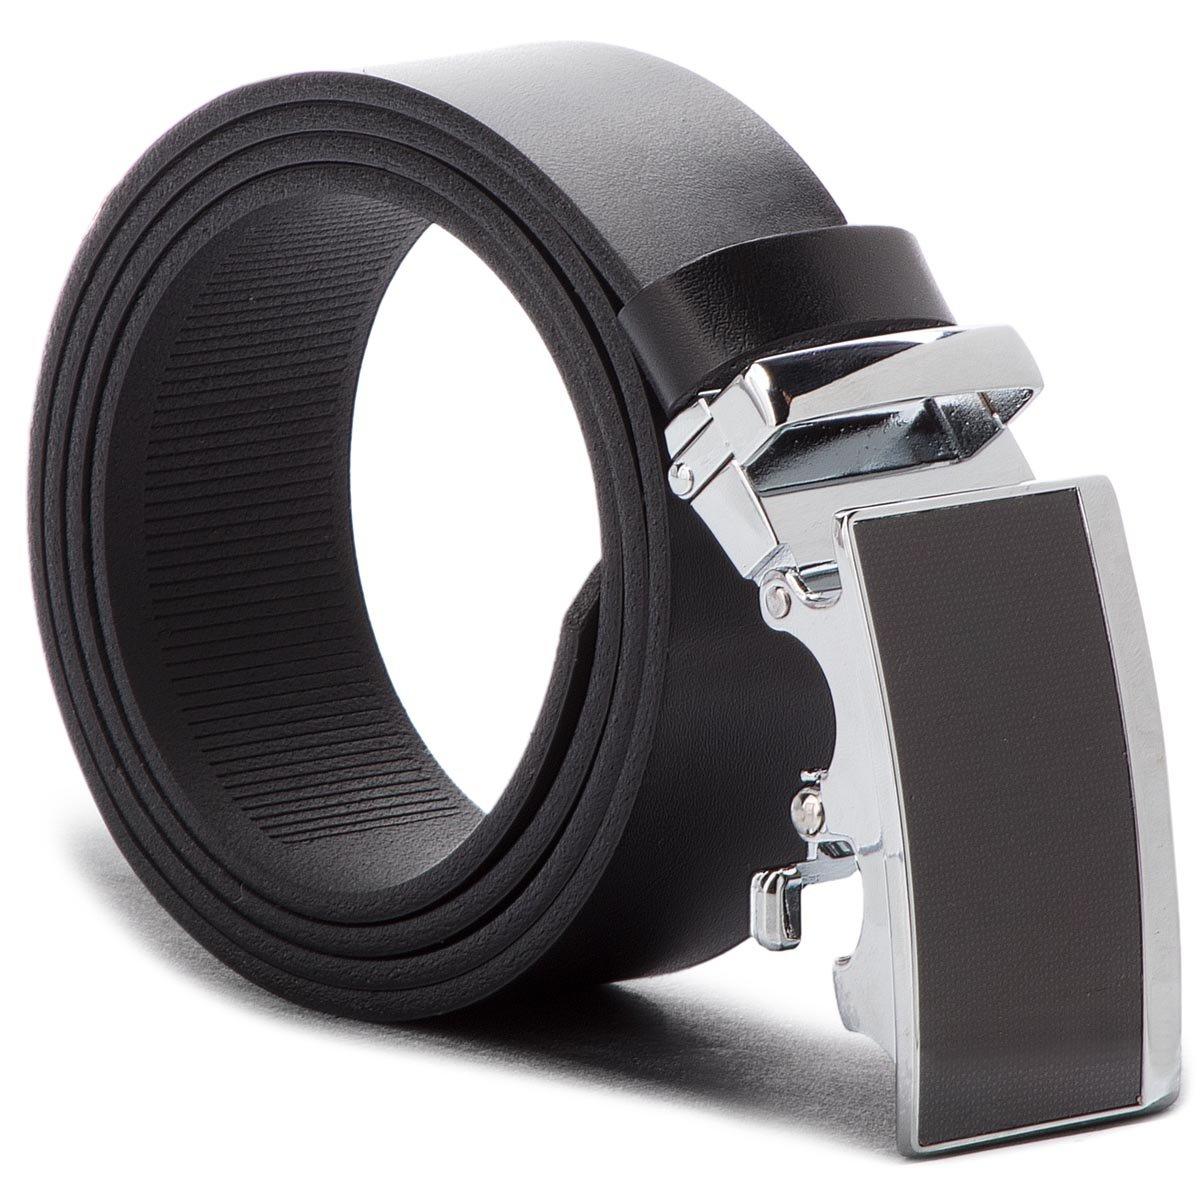 Pánský pásek Lasocki 2M2-015-AW18 černá Pánské - Doplňky - Opasky -  https   ccc.eu 01baaeb918e